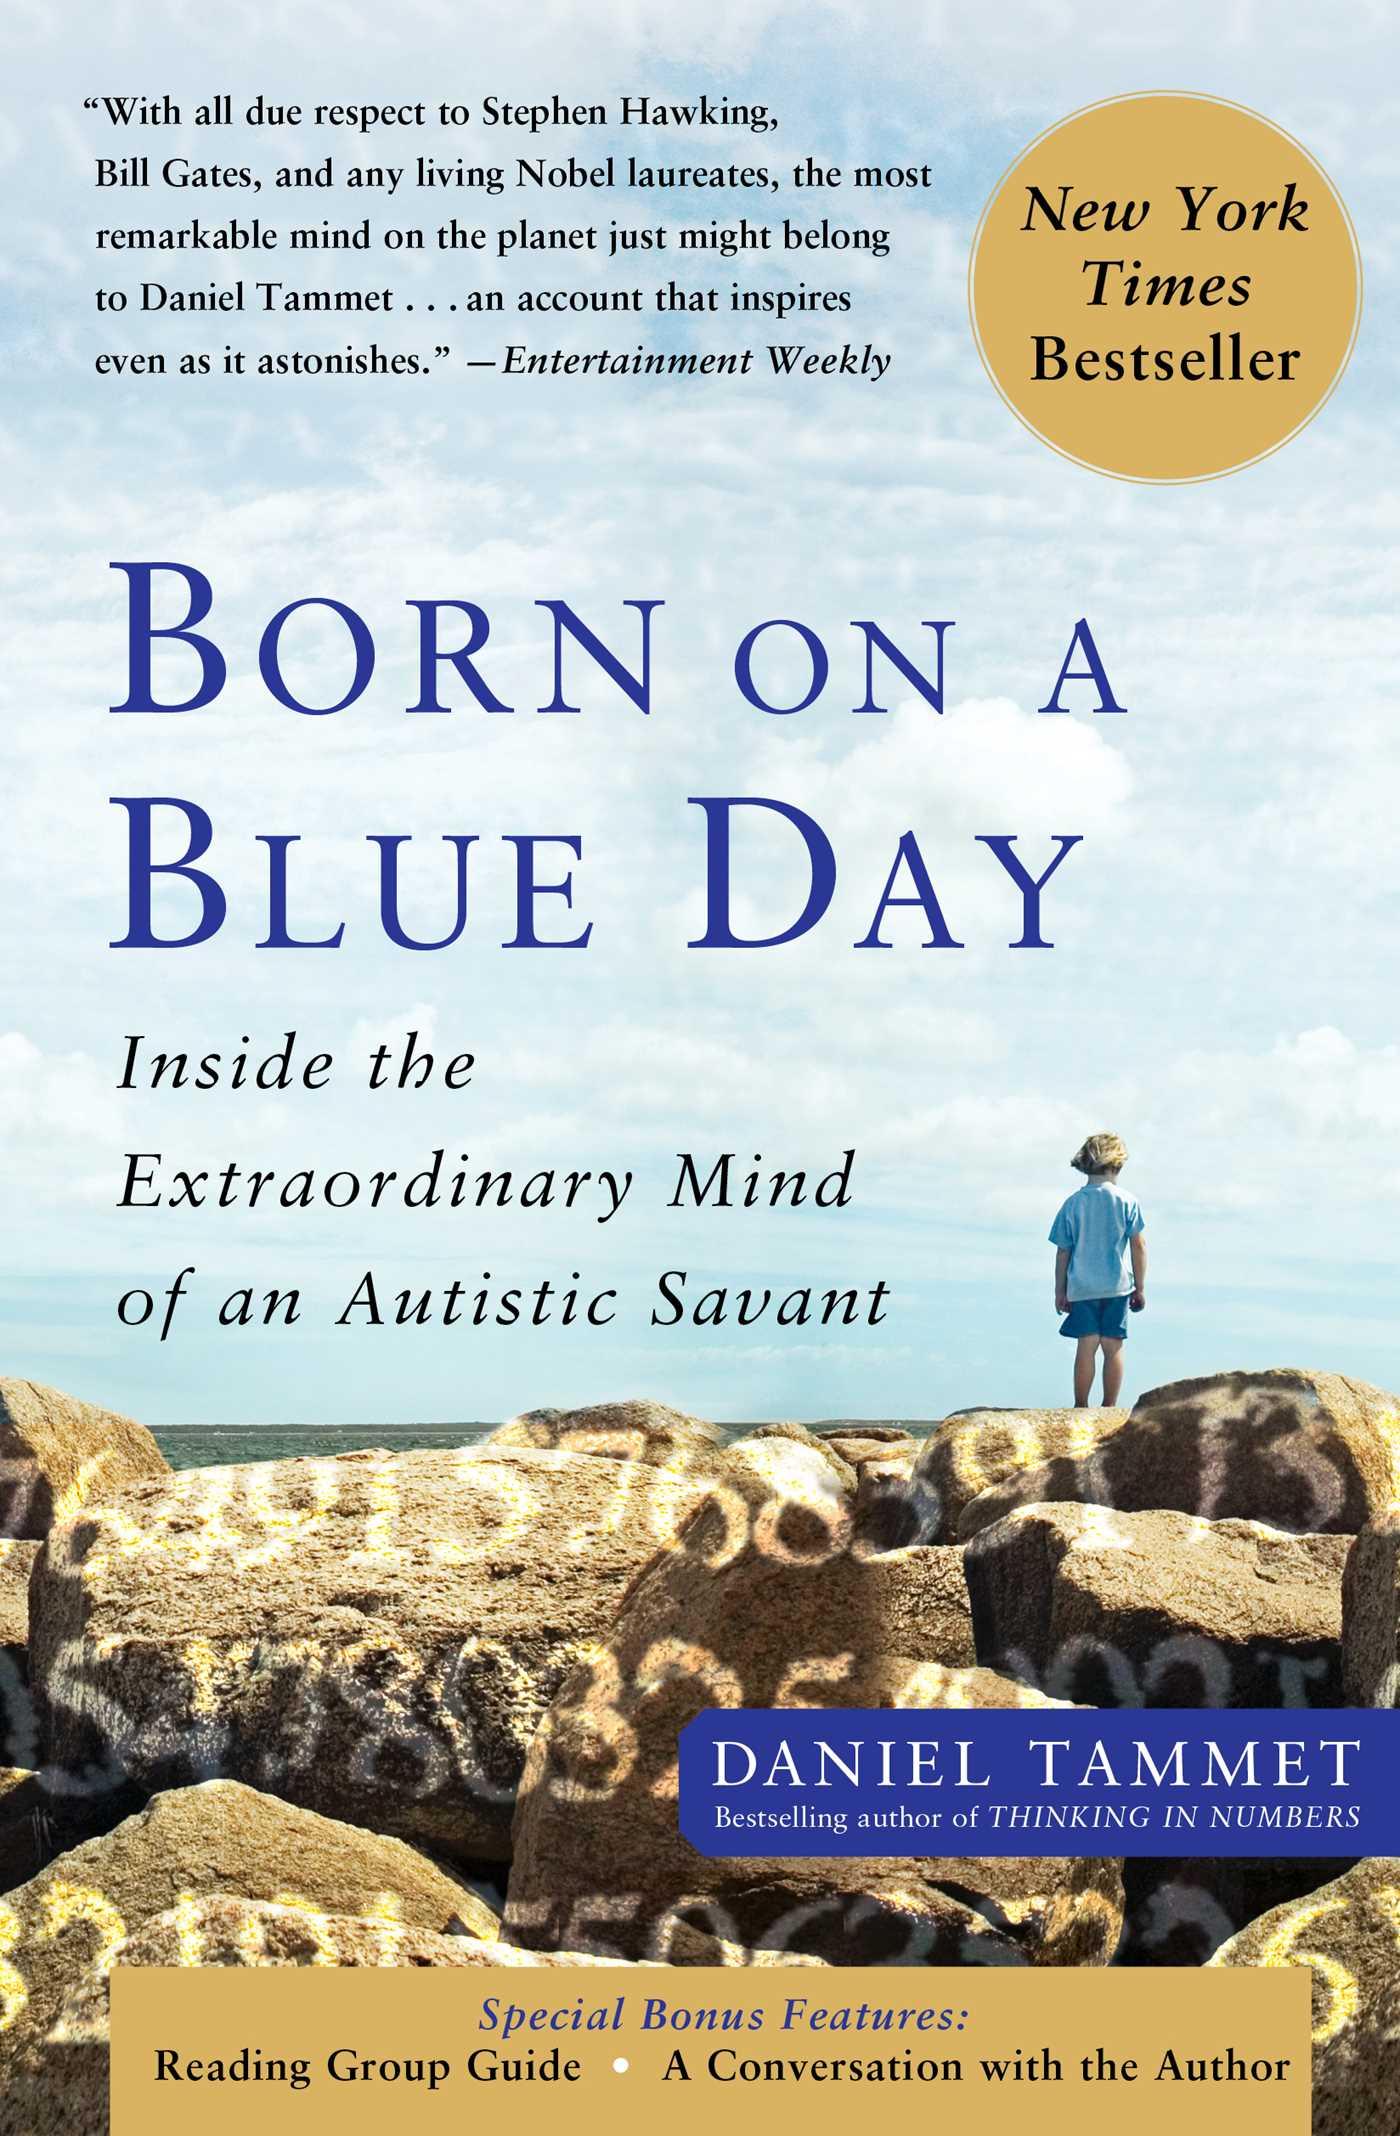 Born on a blue day 9781416549017 hr